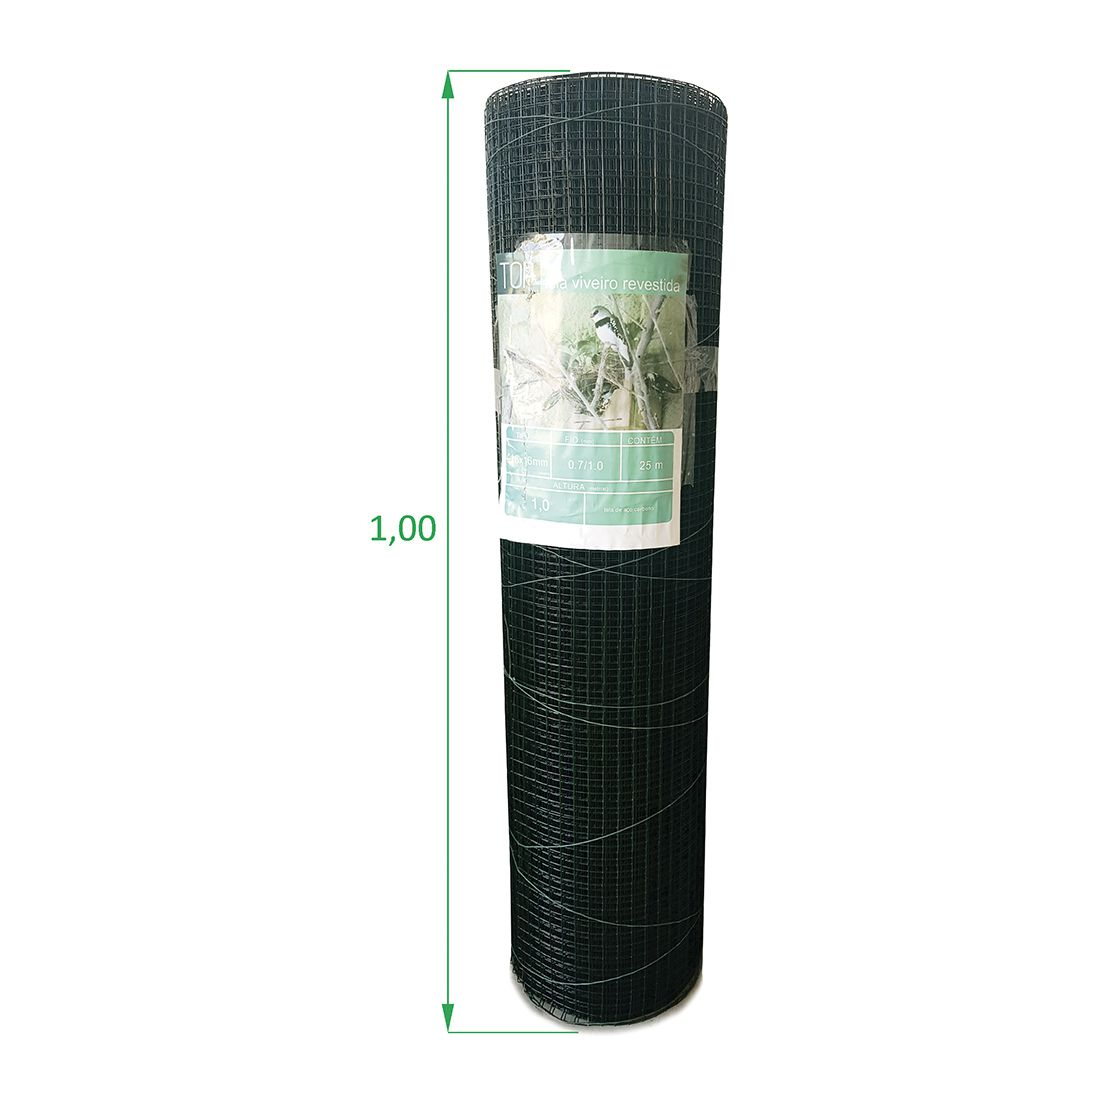 Tela Soldada e Revestida para Viveiro - 1,00 x 25 m - Malha 1,6 x 1,6 cm